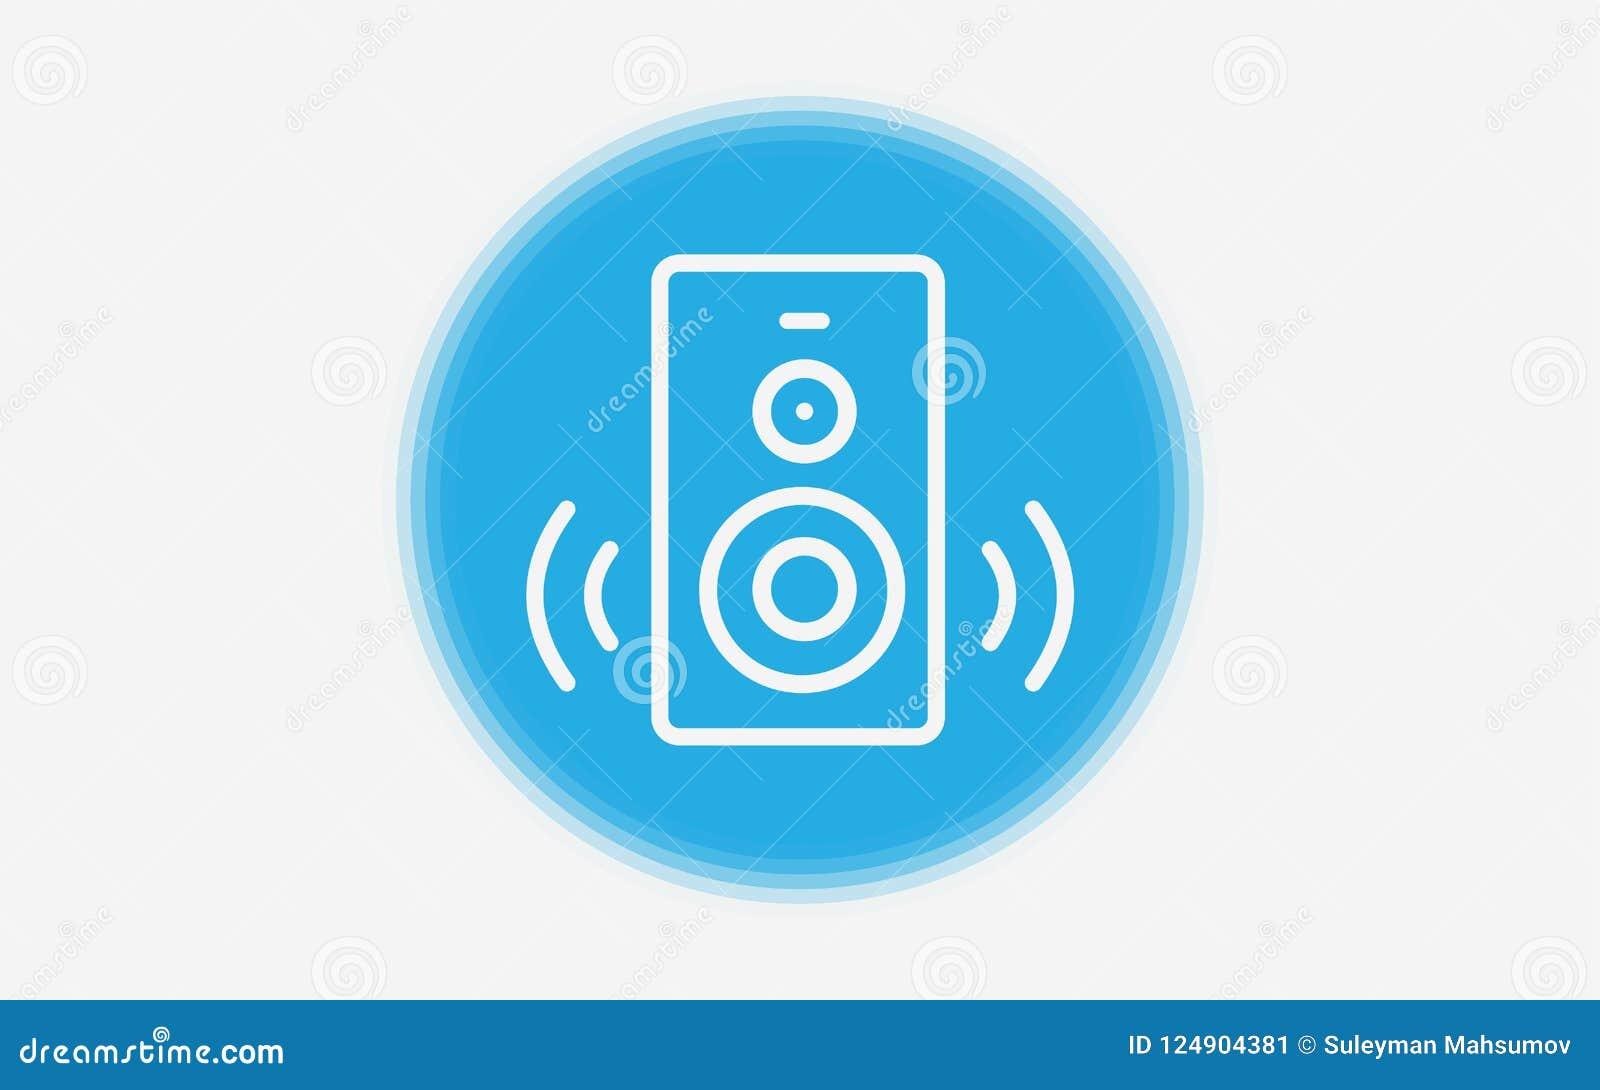 Speaker Vector Icon Sign Symbol Stock Vector Illustration Of Loud